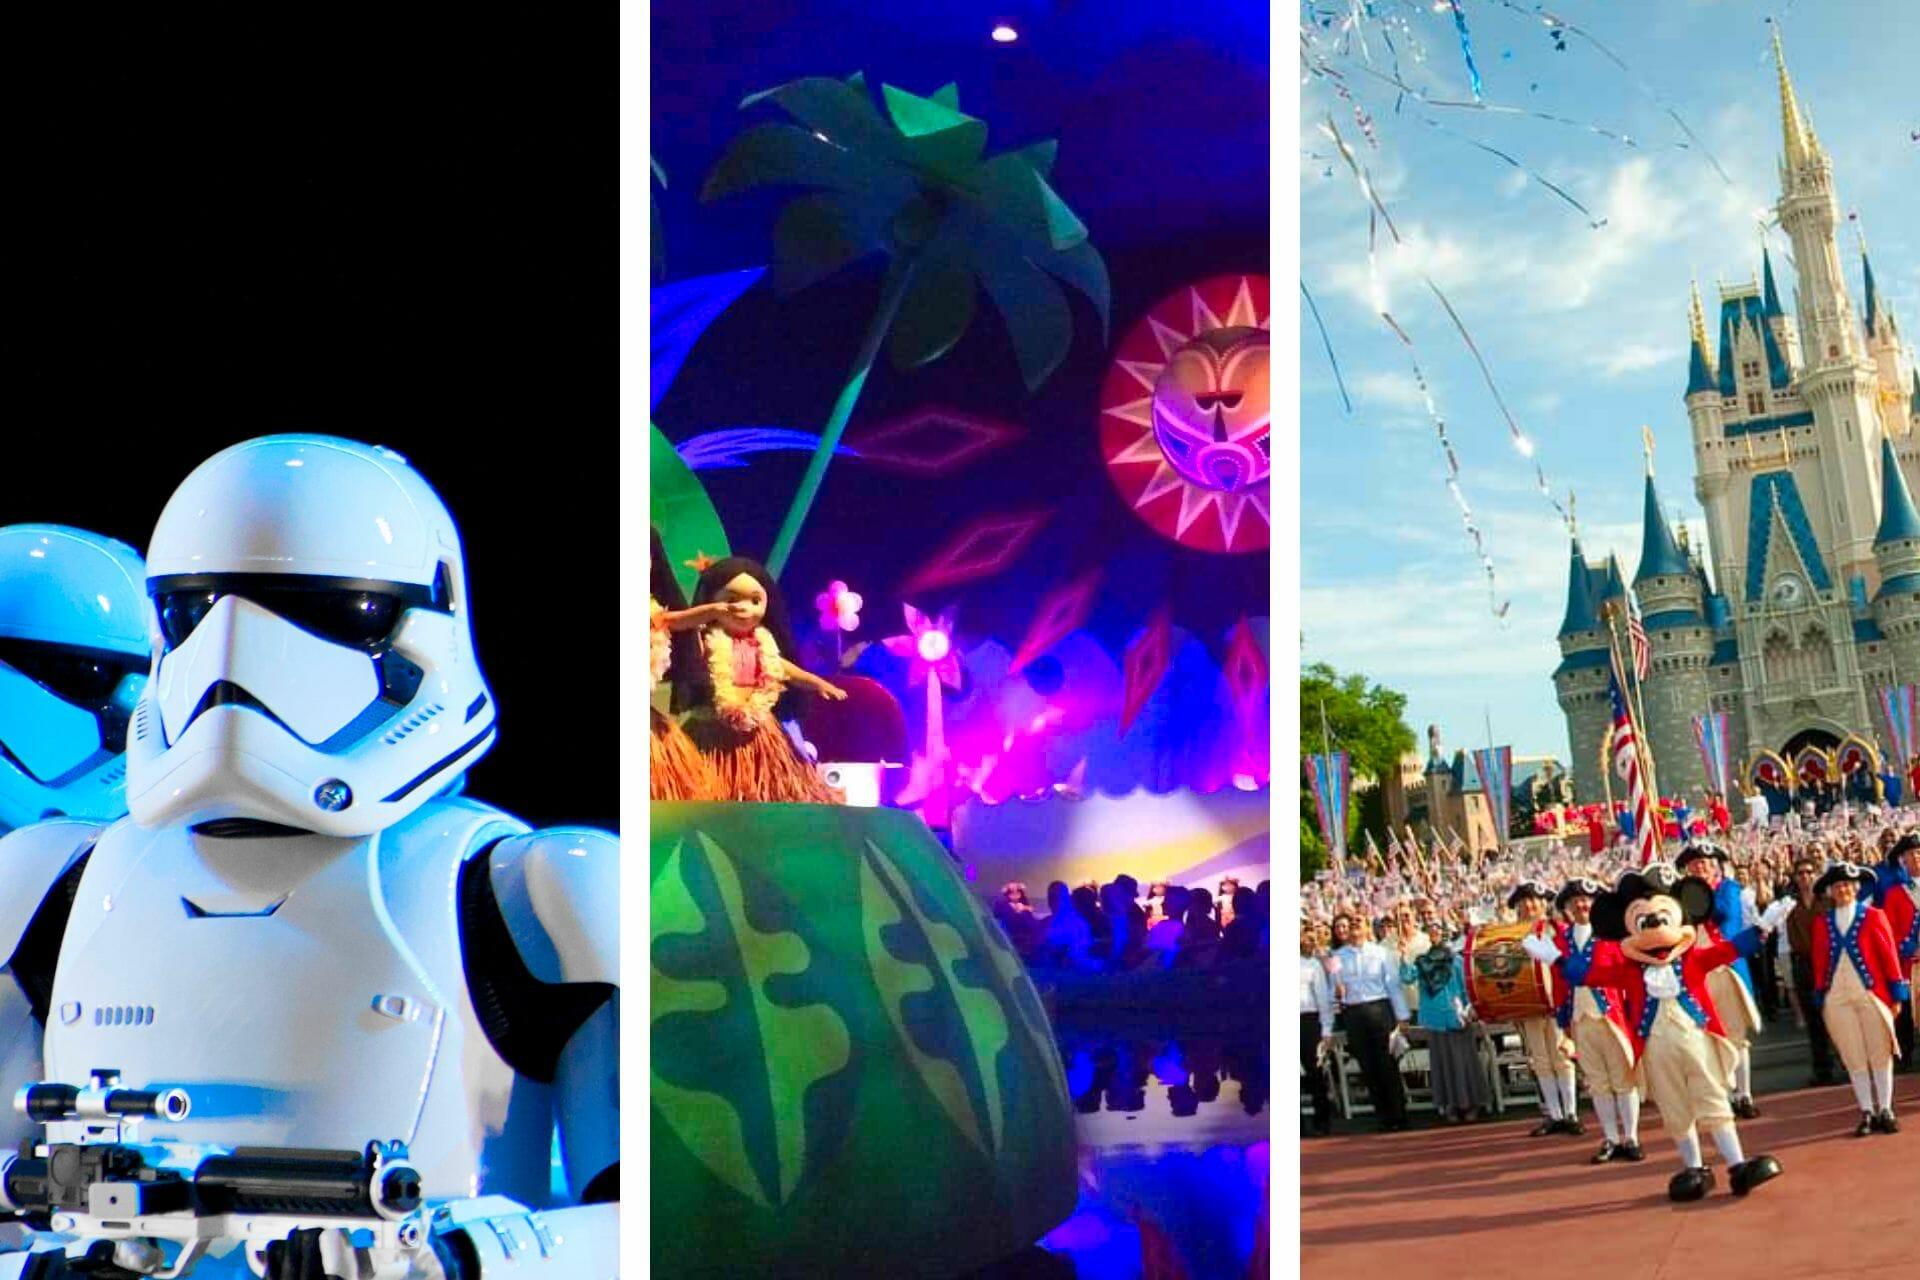 How to Avoid Lines at Disney World 2021 (9 Tips + Tricks) via @allamericanatlas